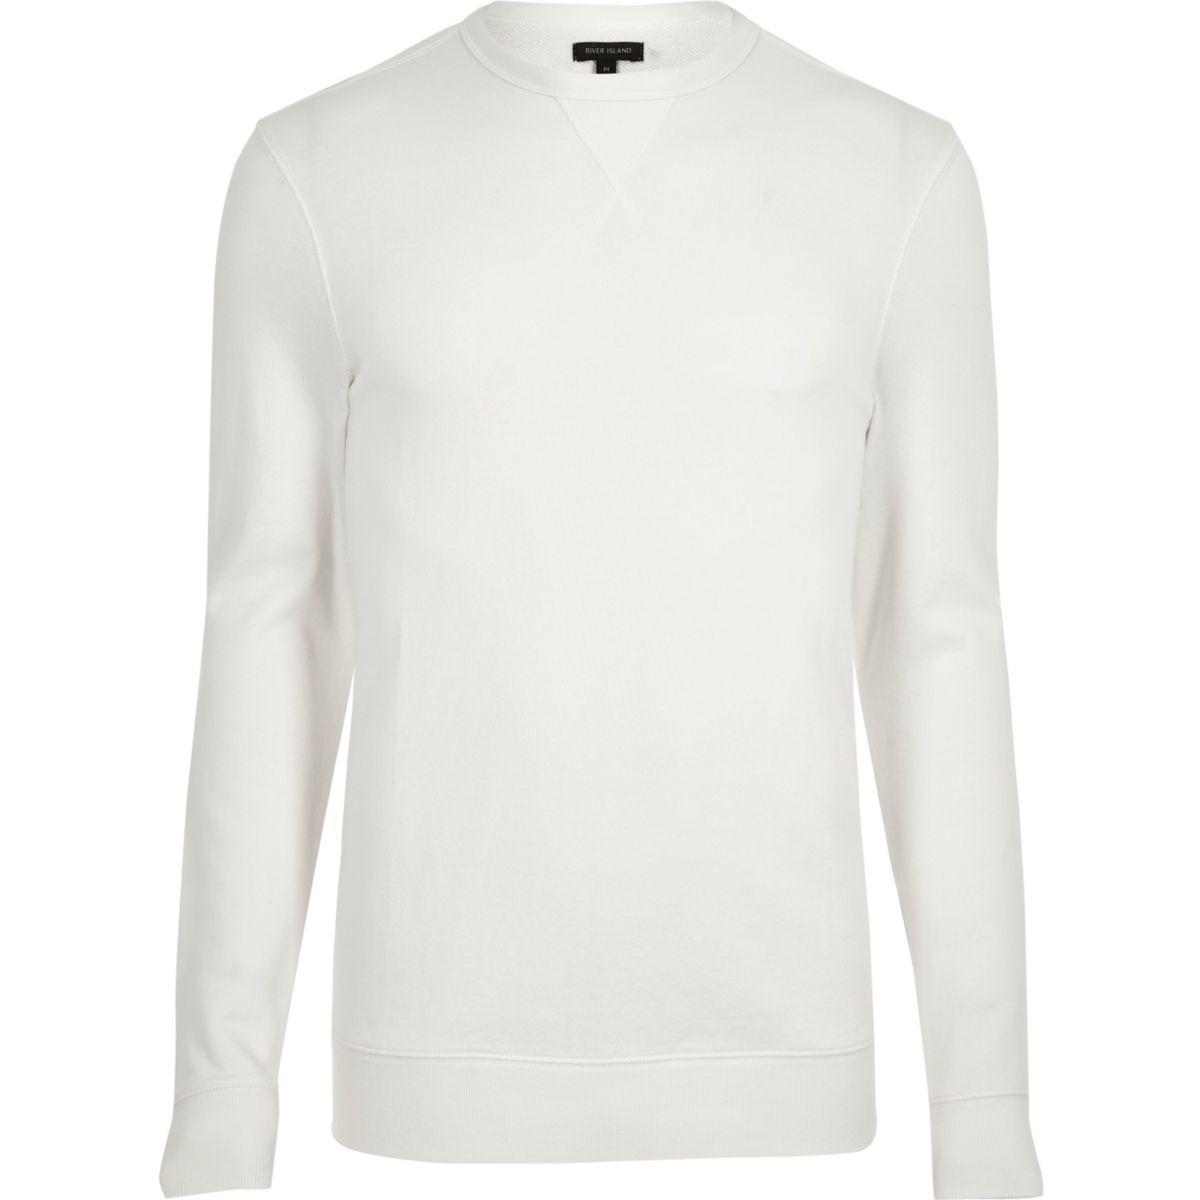 Cream long sleeve muscle fit sweatshirt